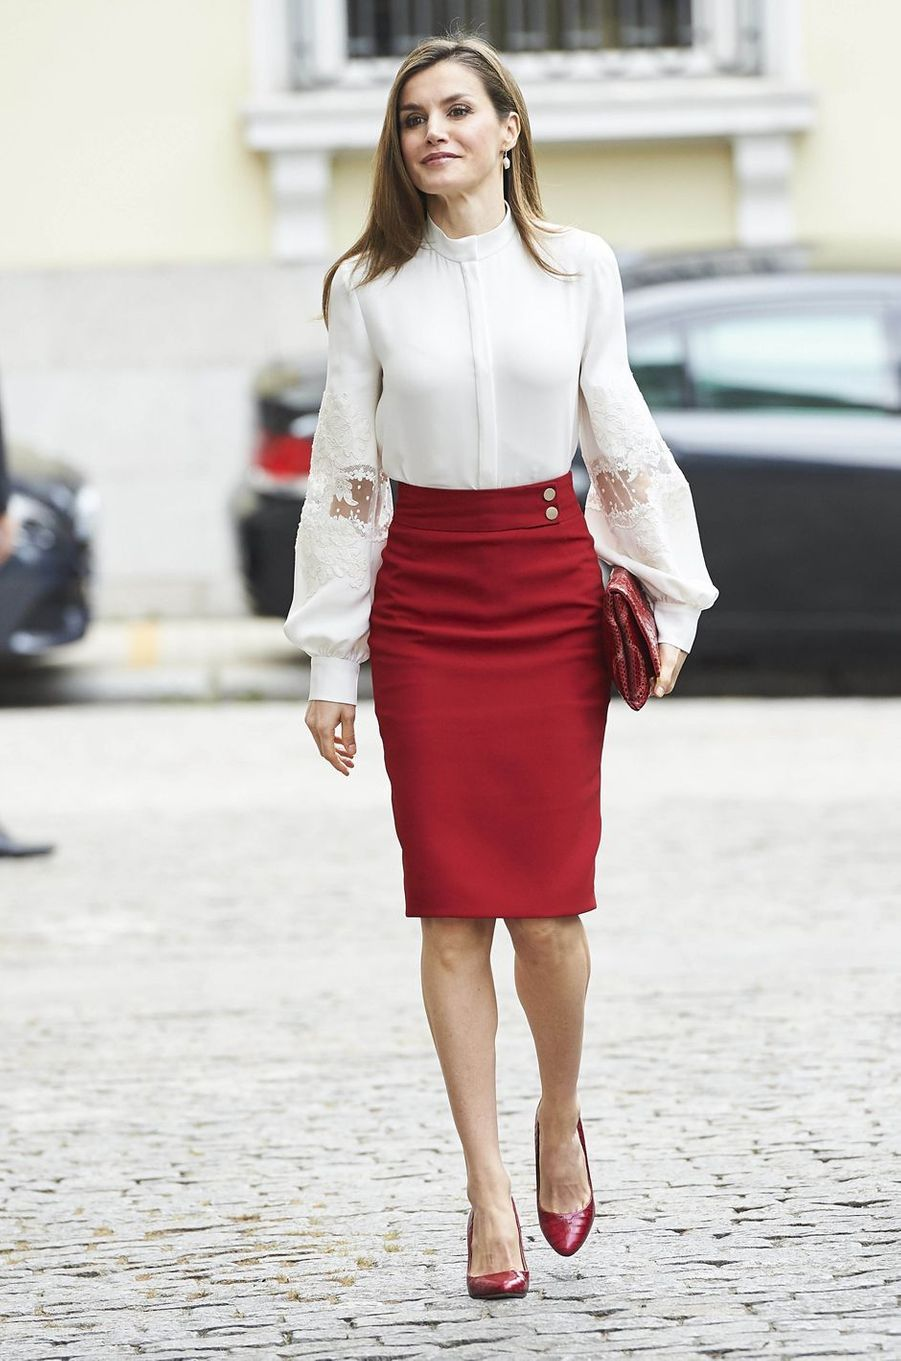 La reine Letizia d'Espagne en Carolina Herrera et Hugo Boss à Madrid, le 29 mai 2017